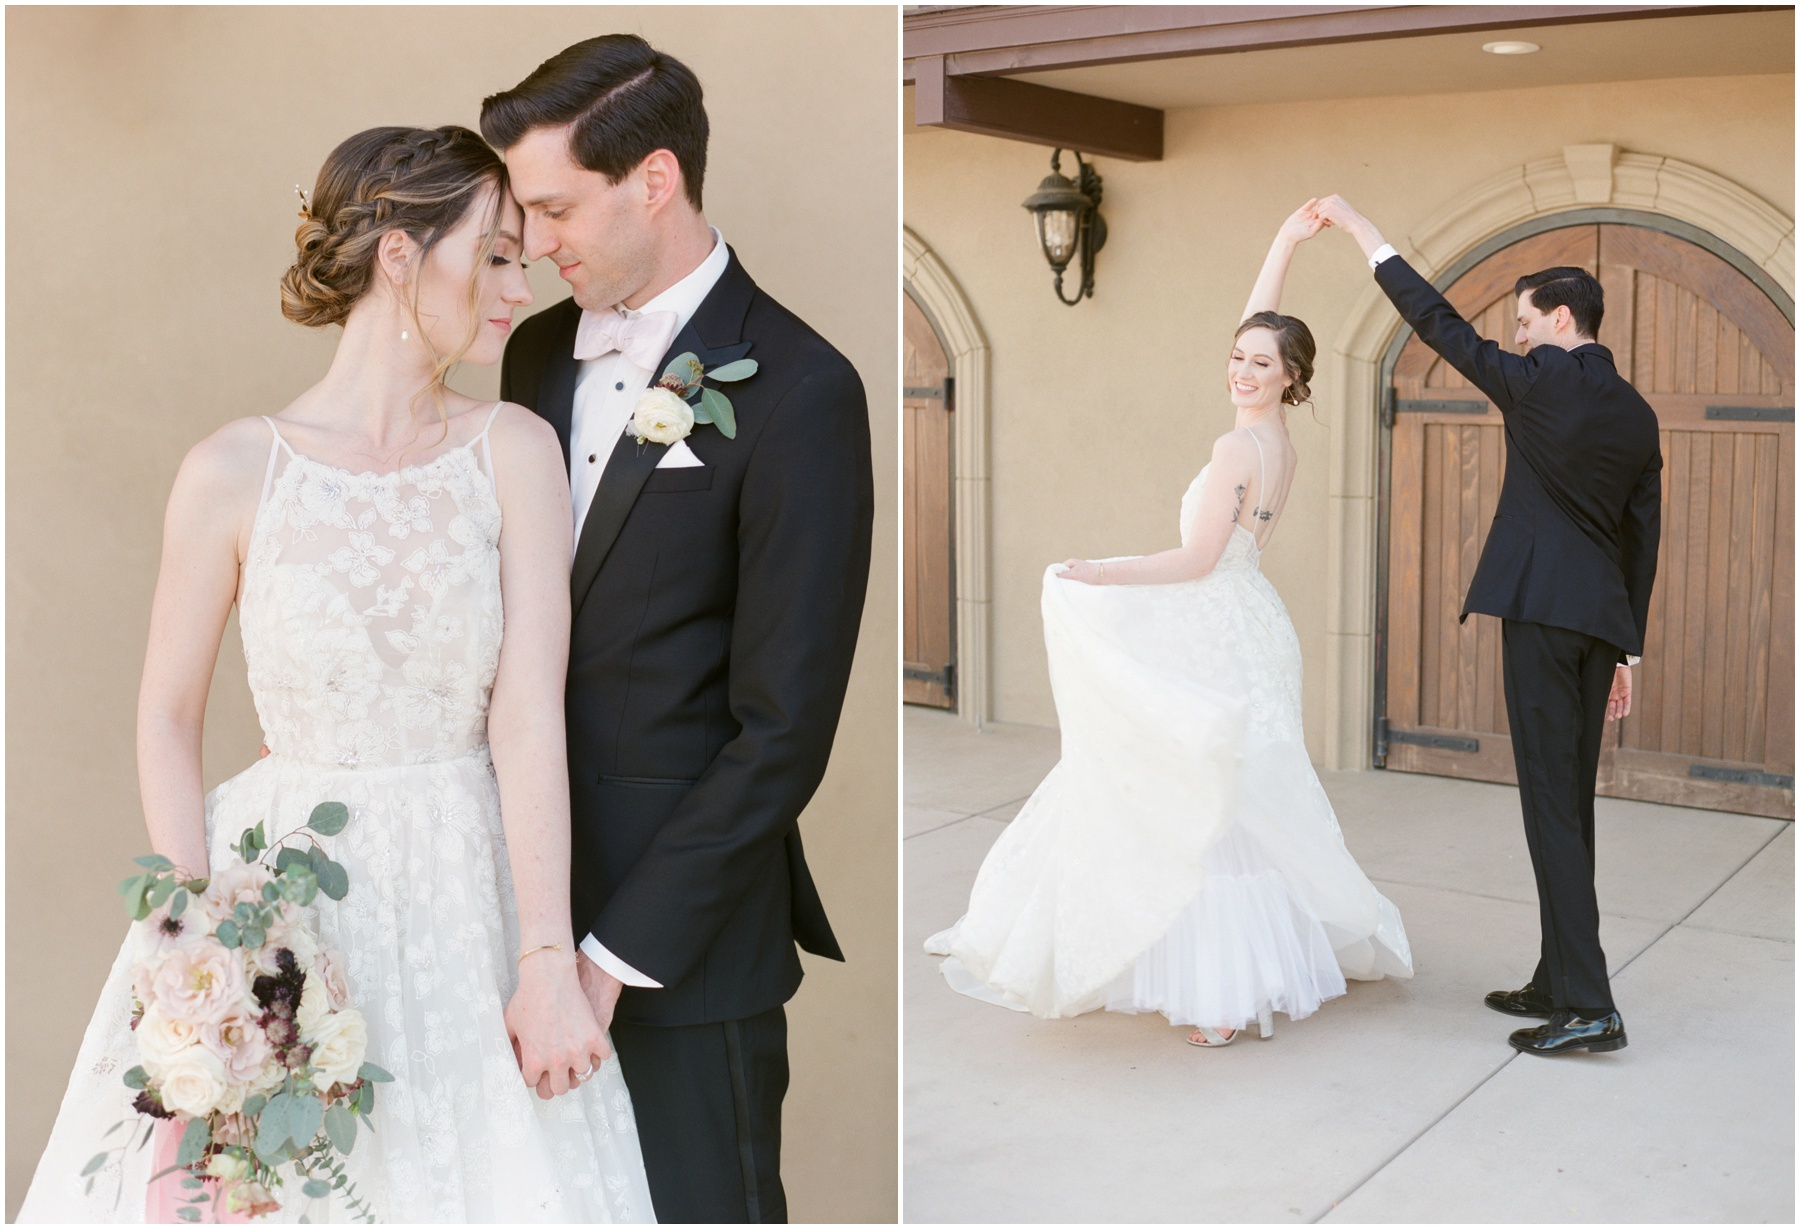 Scribner-bend-vineyards-wedding-sacramento-california-Kristine-Herman-Photography-230.jpg